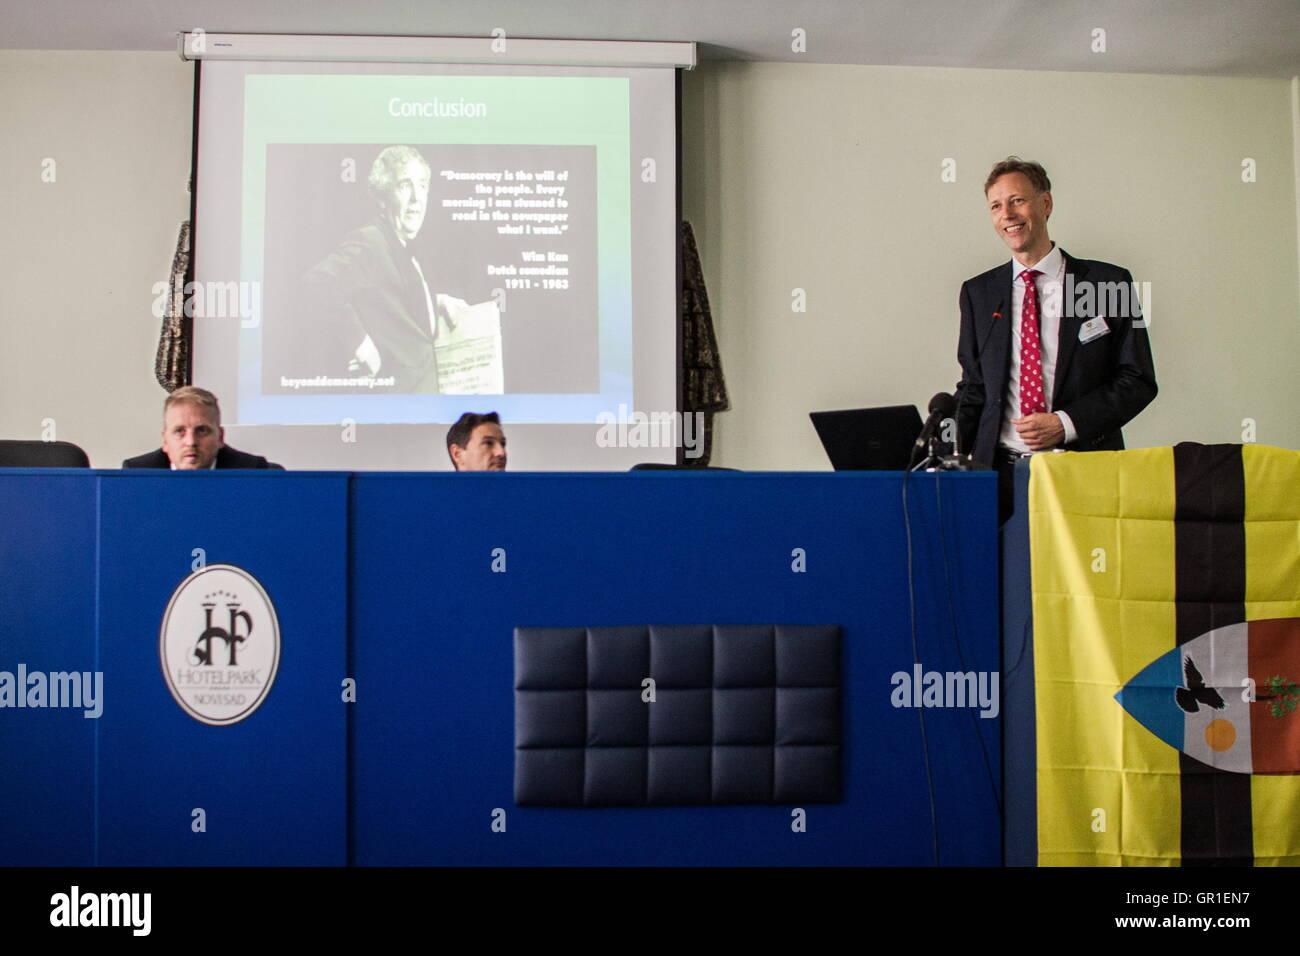 Aug 29, 2016 - Novi Sad, Serbia - Conference for the Liberland matters in Novi Sad on August 27th. The Free Republic - Stock Image